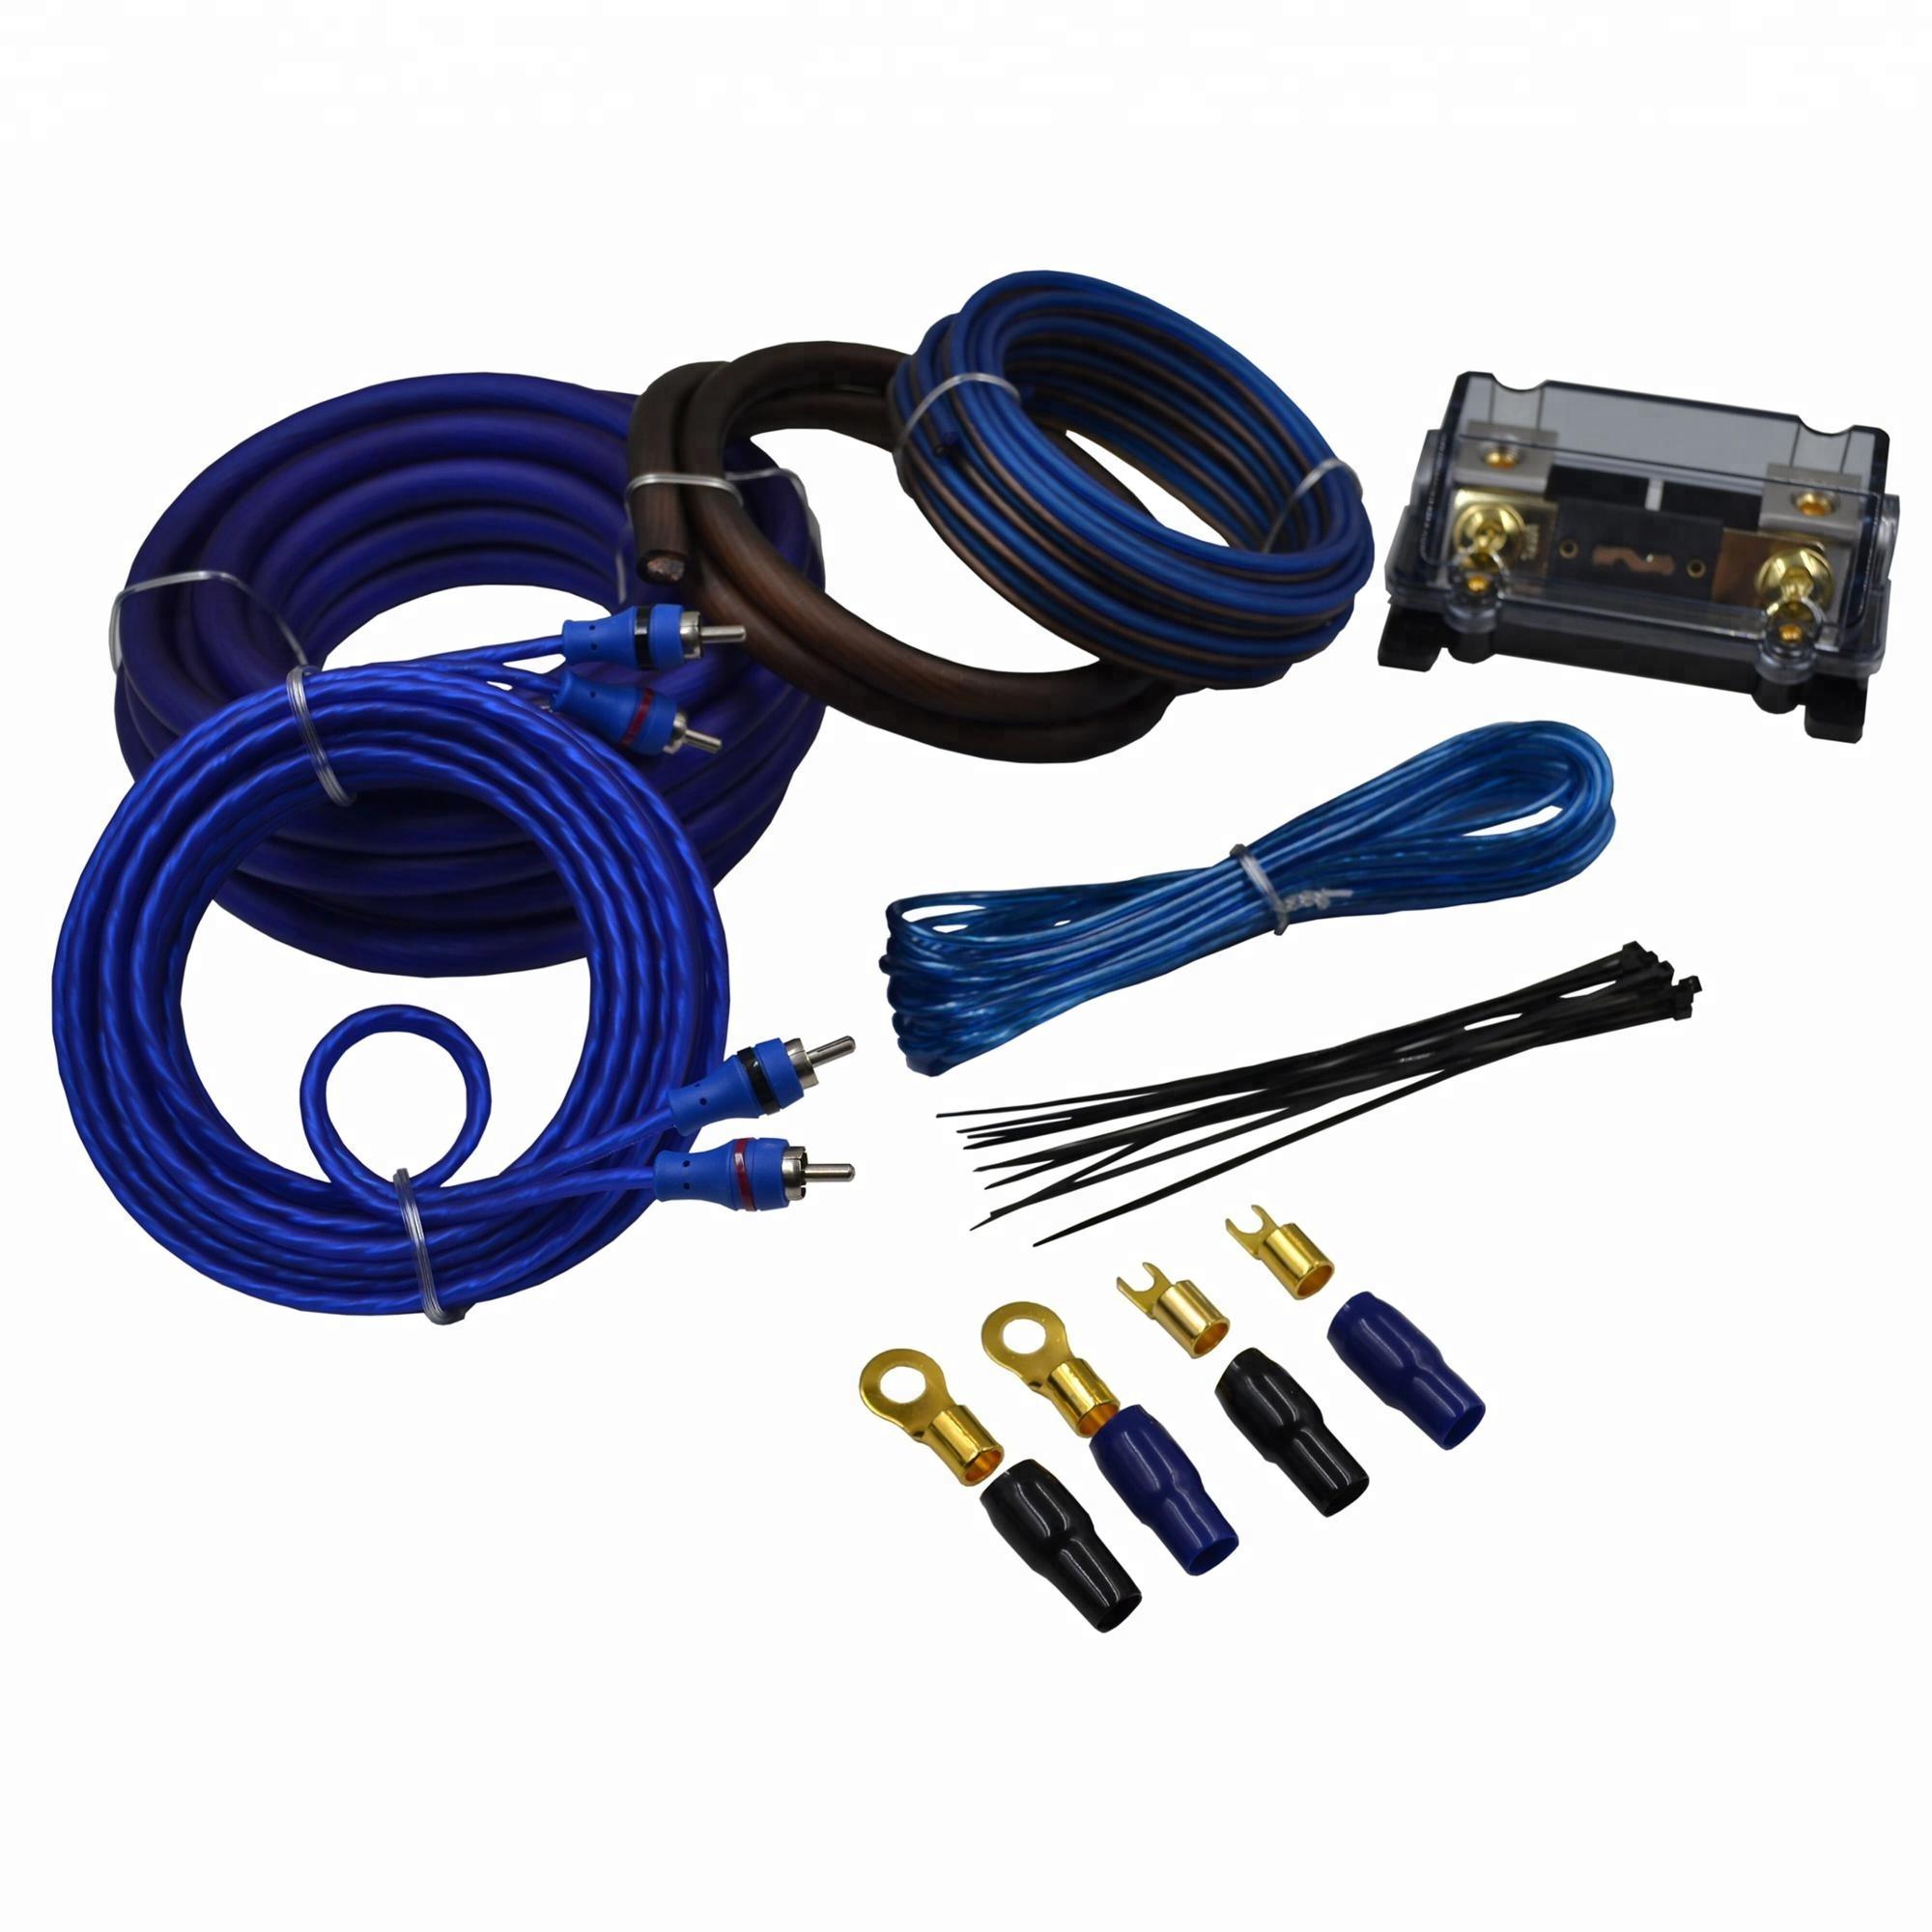 High Quality Audiophile 4ga Car Amplifier Wiring Kit - Buy Car Amplifier on